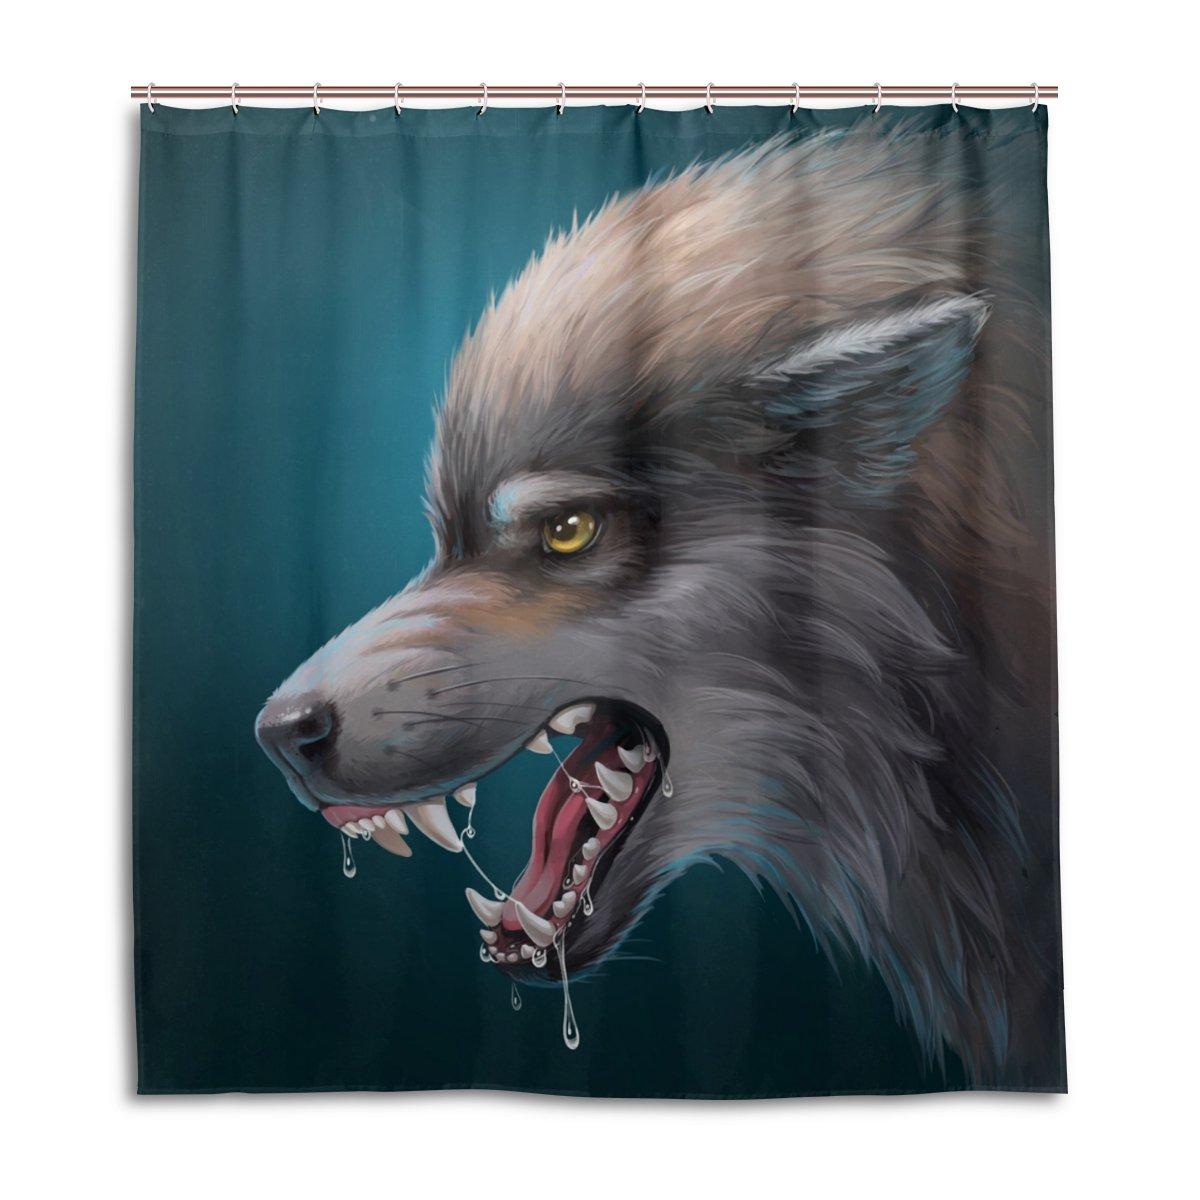 LEISISI Custom Draw Animals Waterproof Bathroom Fabric Shower Curtain 66'' x 72''